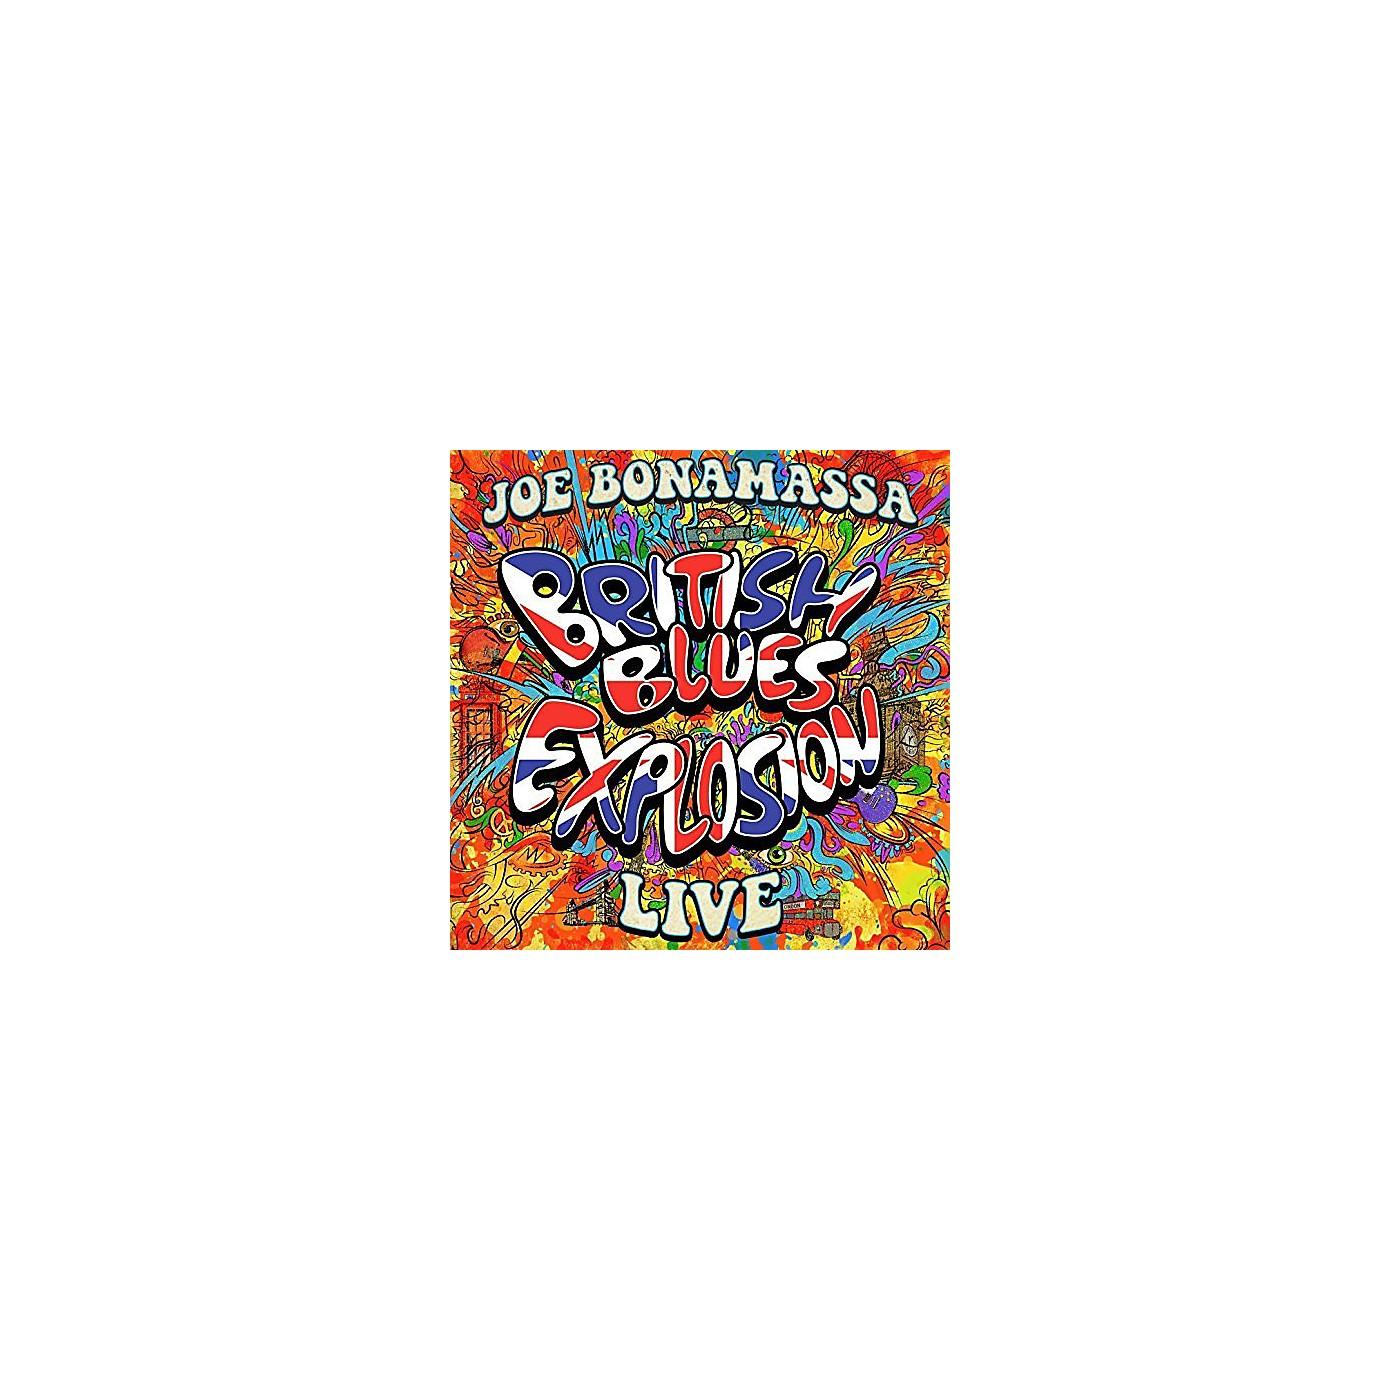 Alliance Joe Bonamassa - British Blues Explosion Live thumbnail